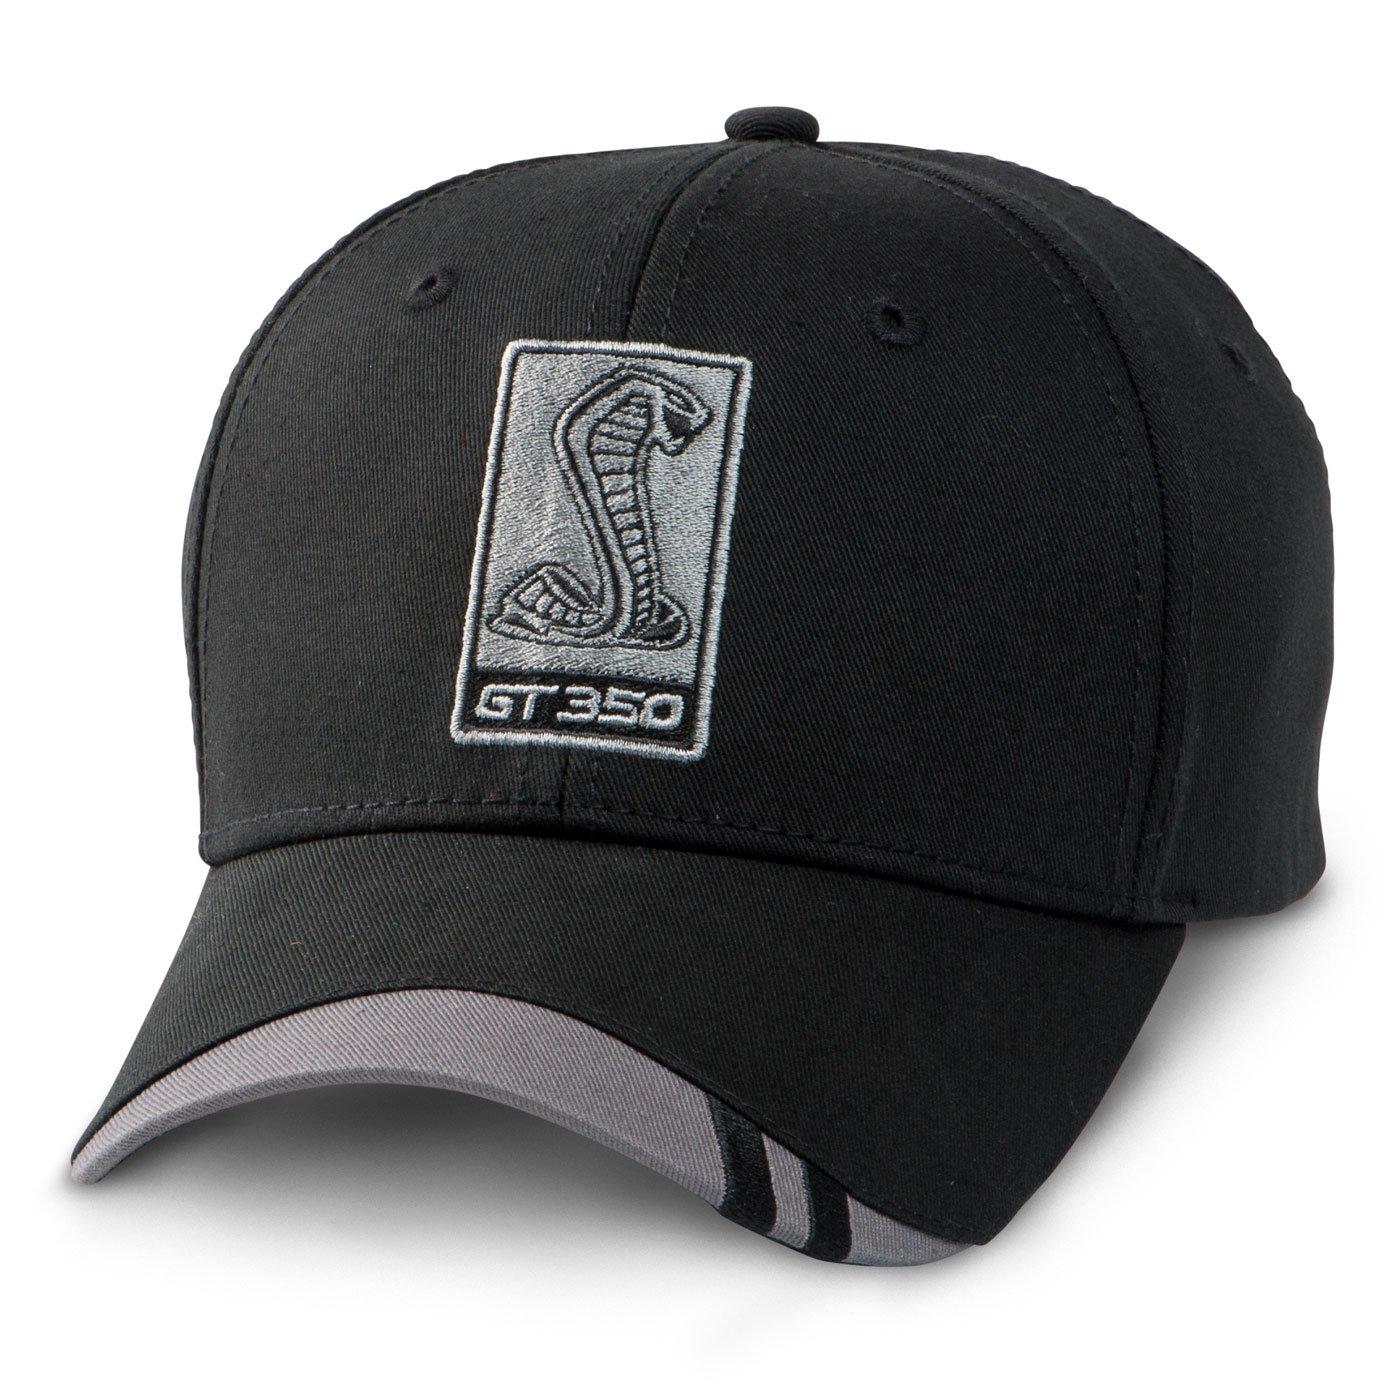 Ford Cobra GT350 Black Cotton Hat FOO